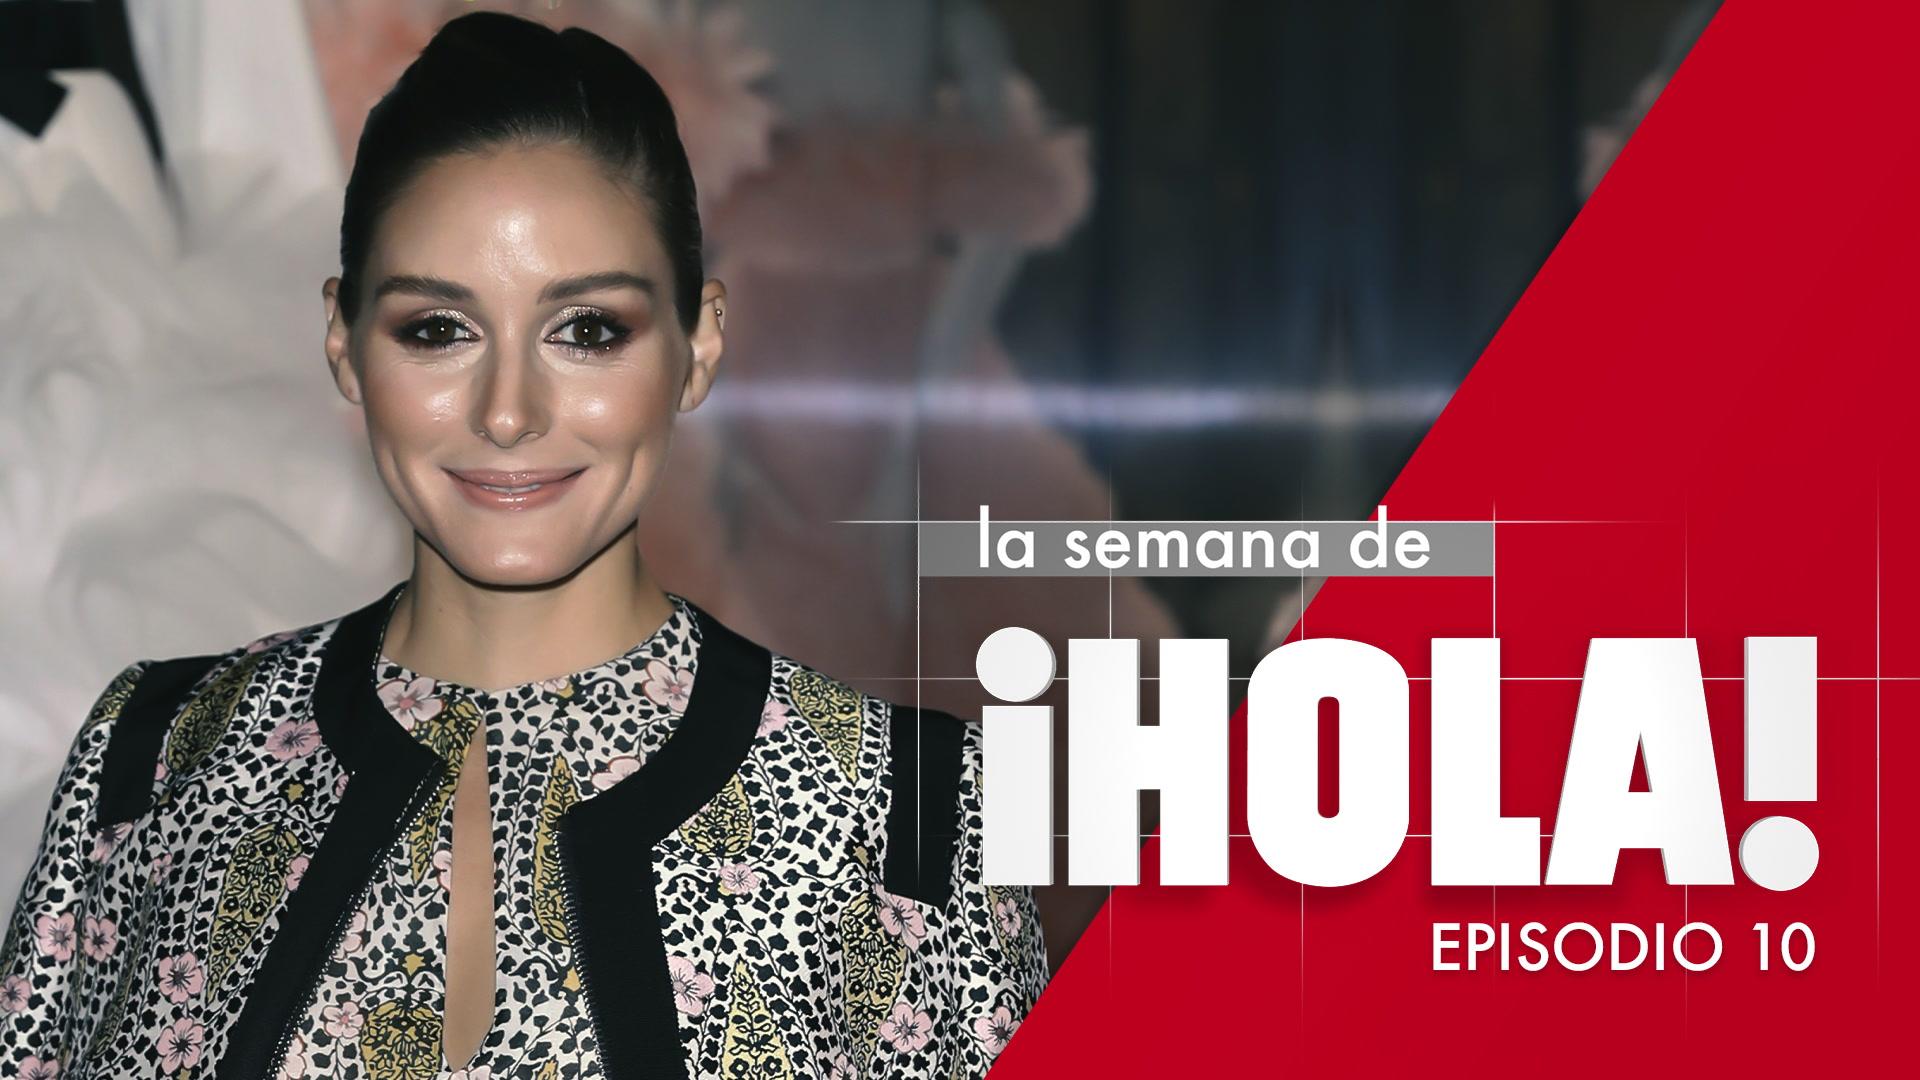 La semana de ¡HOLA! - Episodio 10